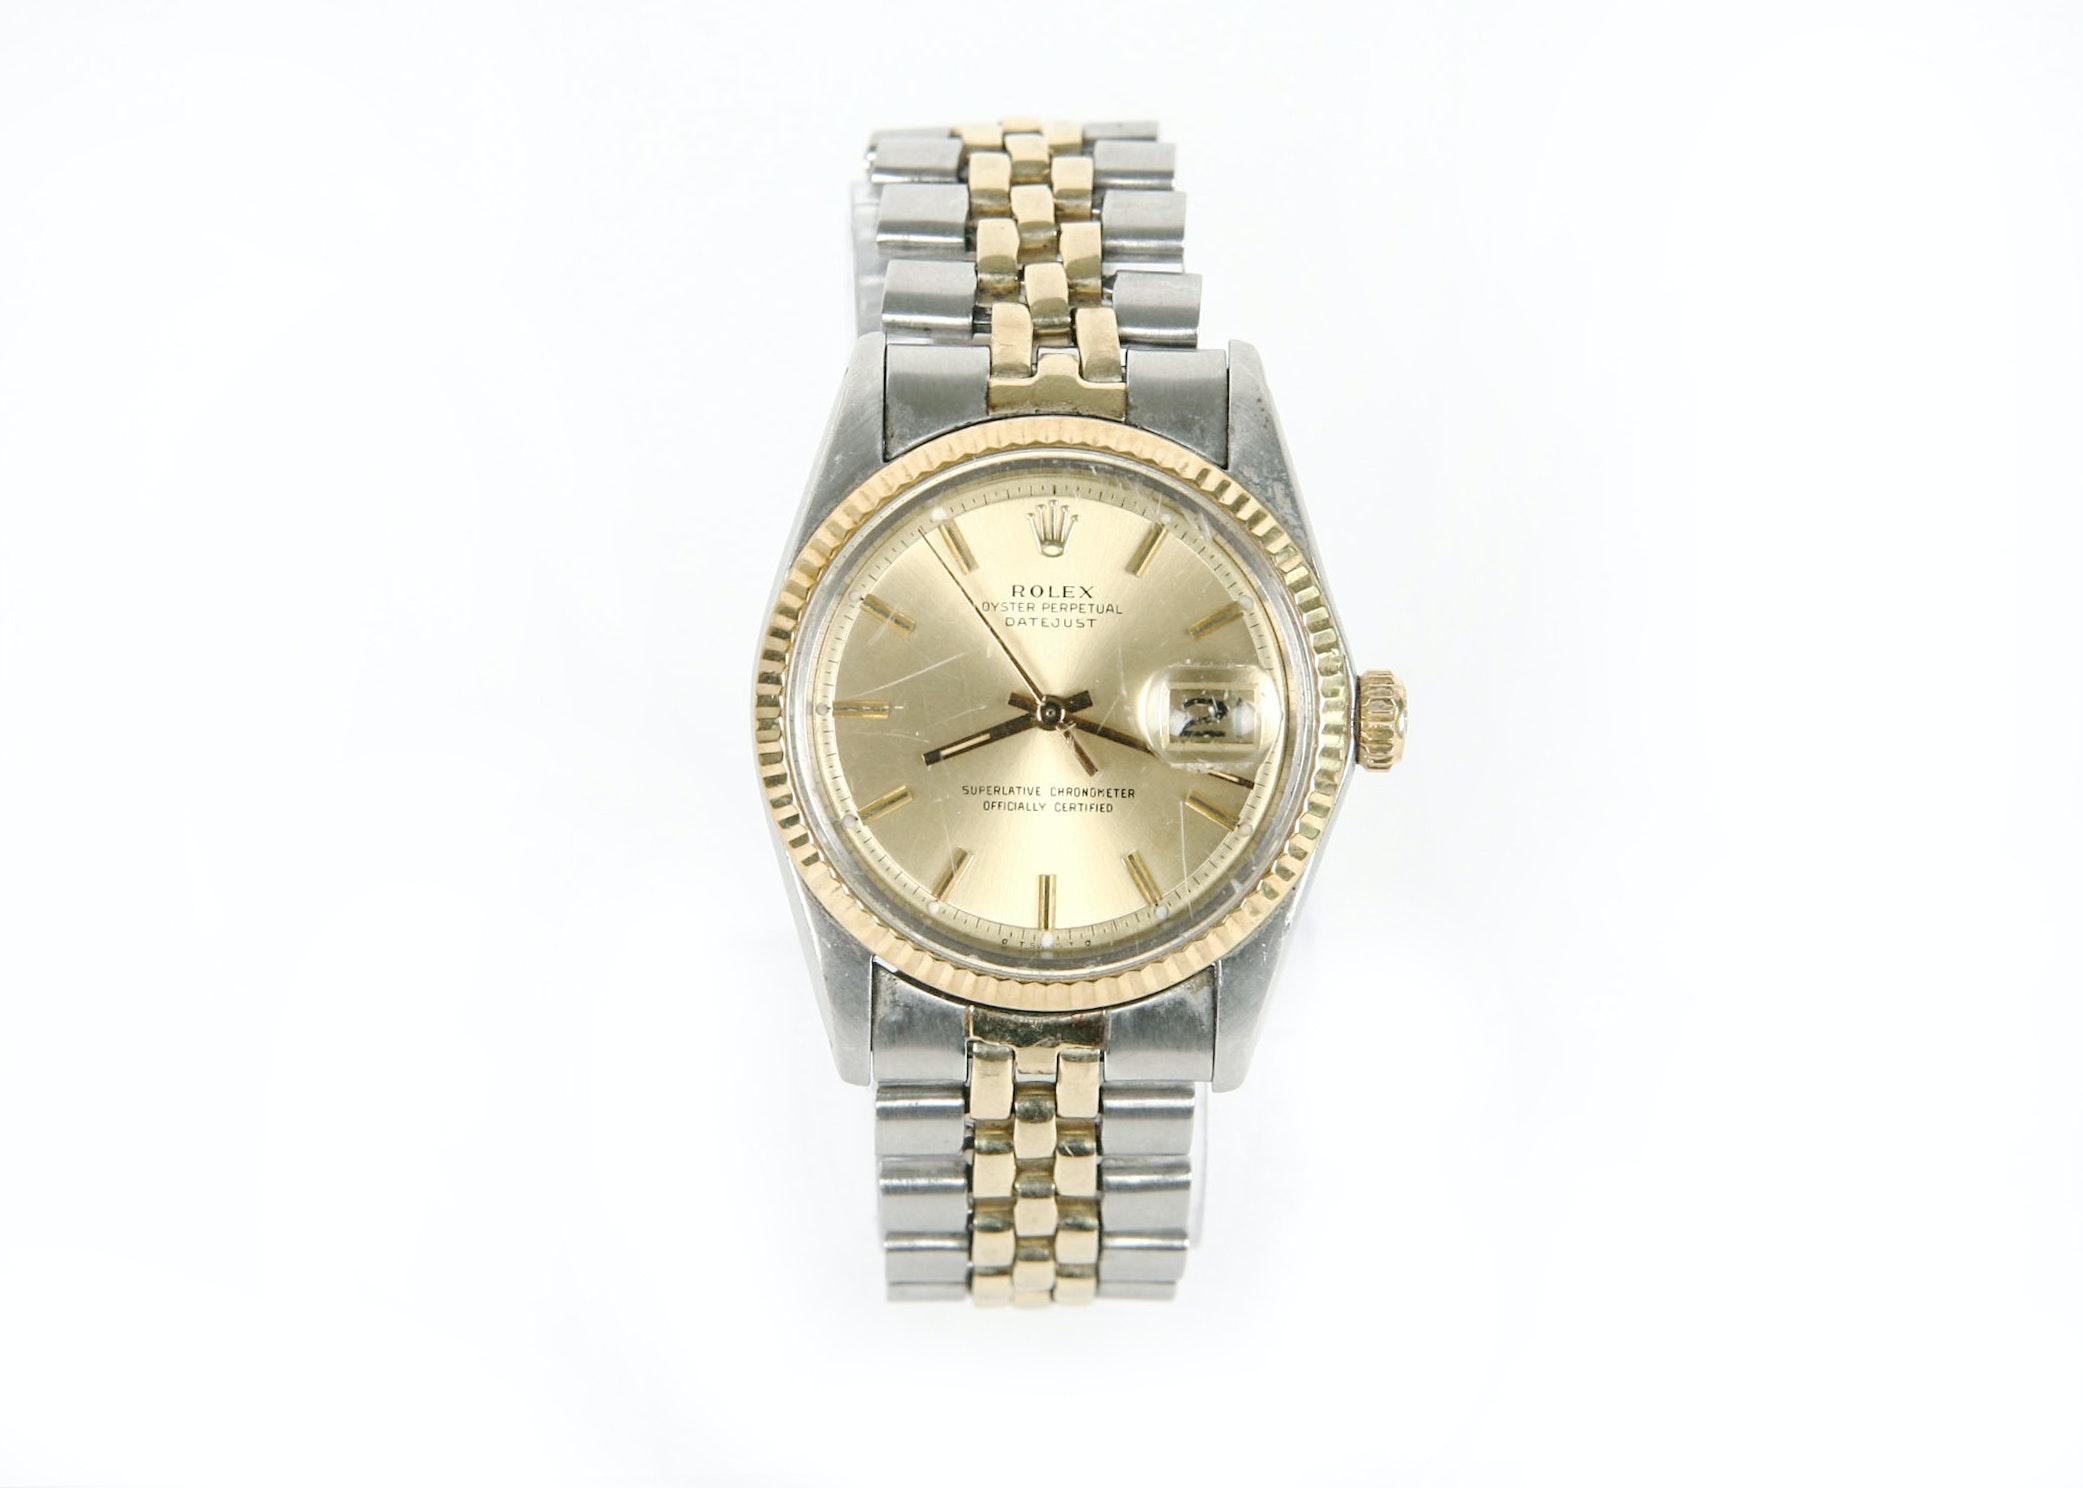 Men's Rolex Oyster Perpetual Datejust 14K Gold Trim Wristwatch